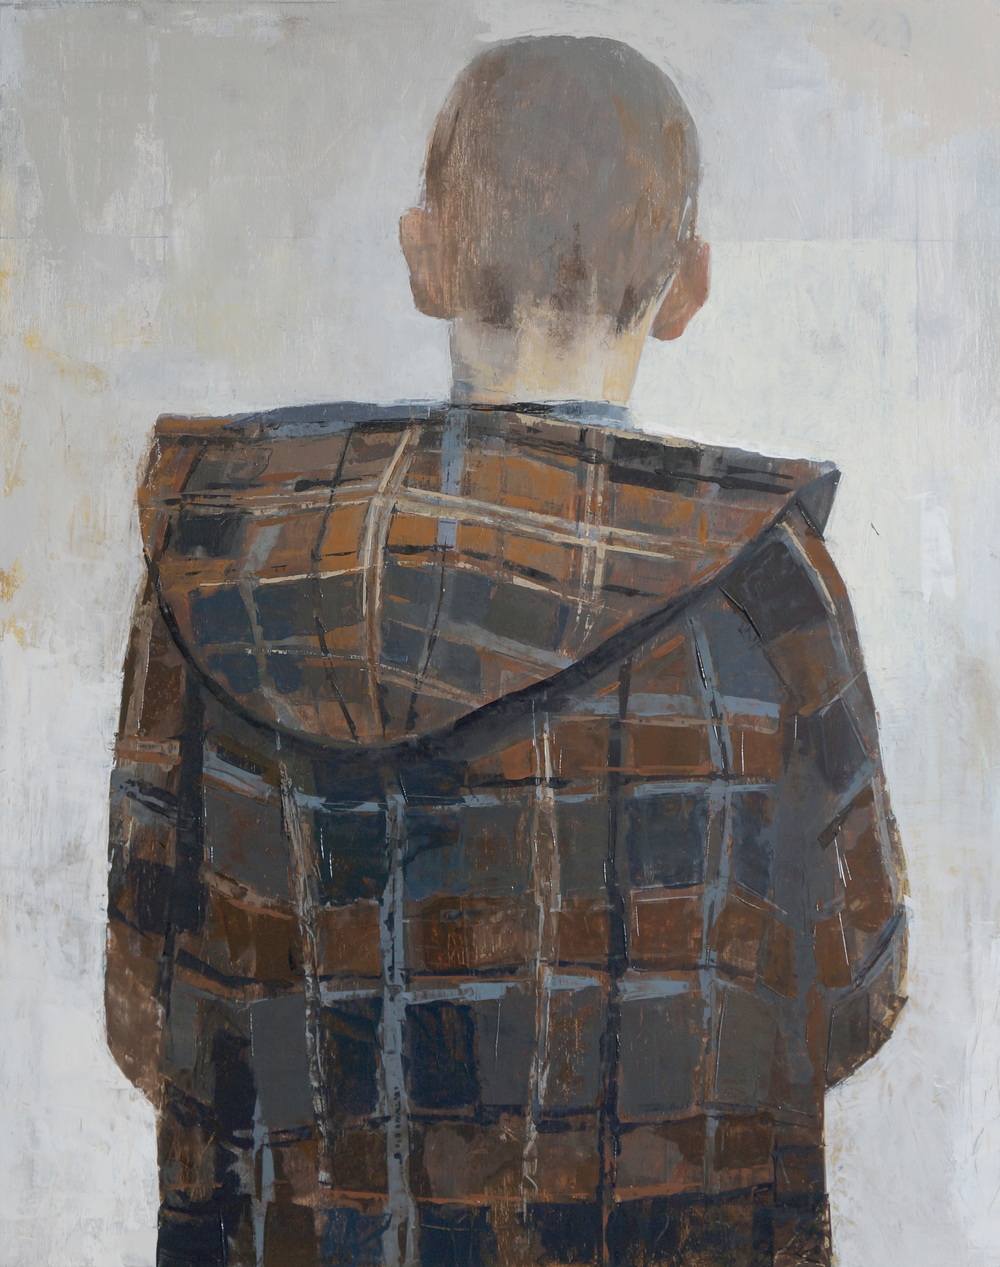 Stephen's Jacket